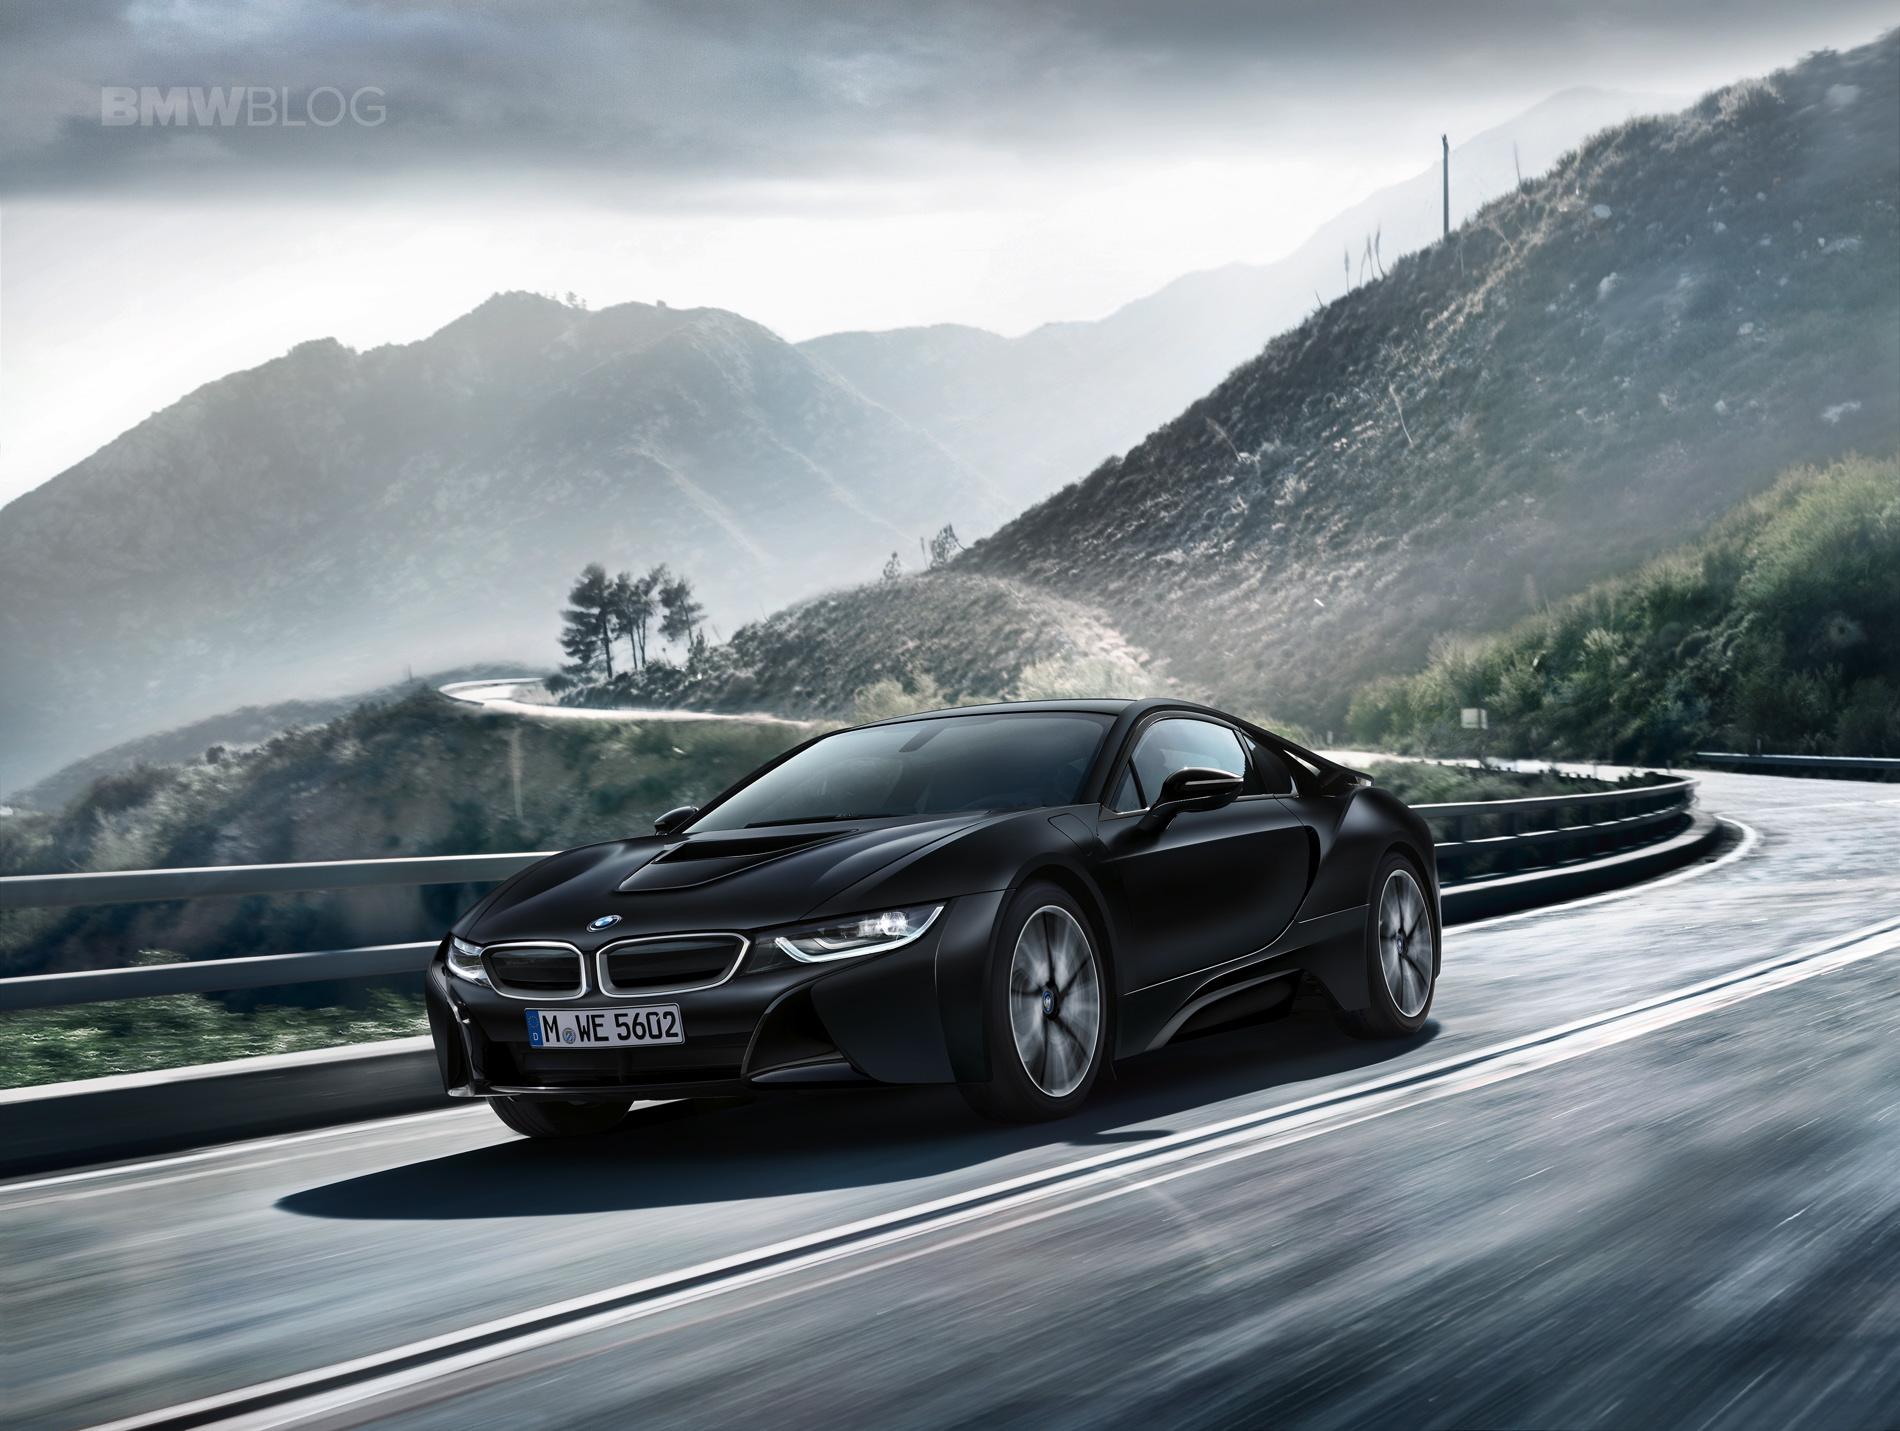 BMW i8 Protonic Frozen Black Edition 09